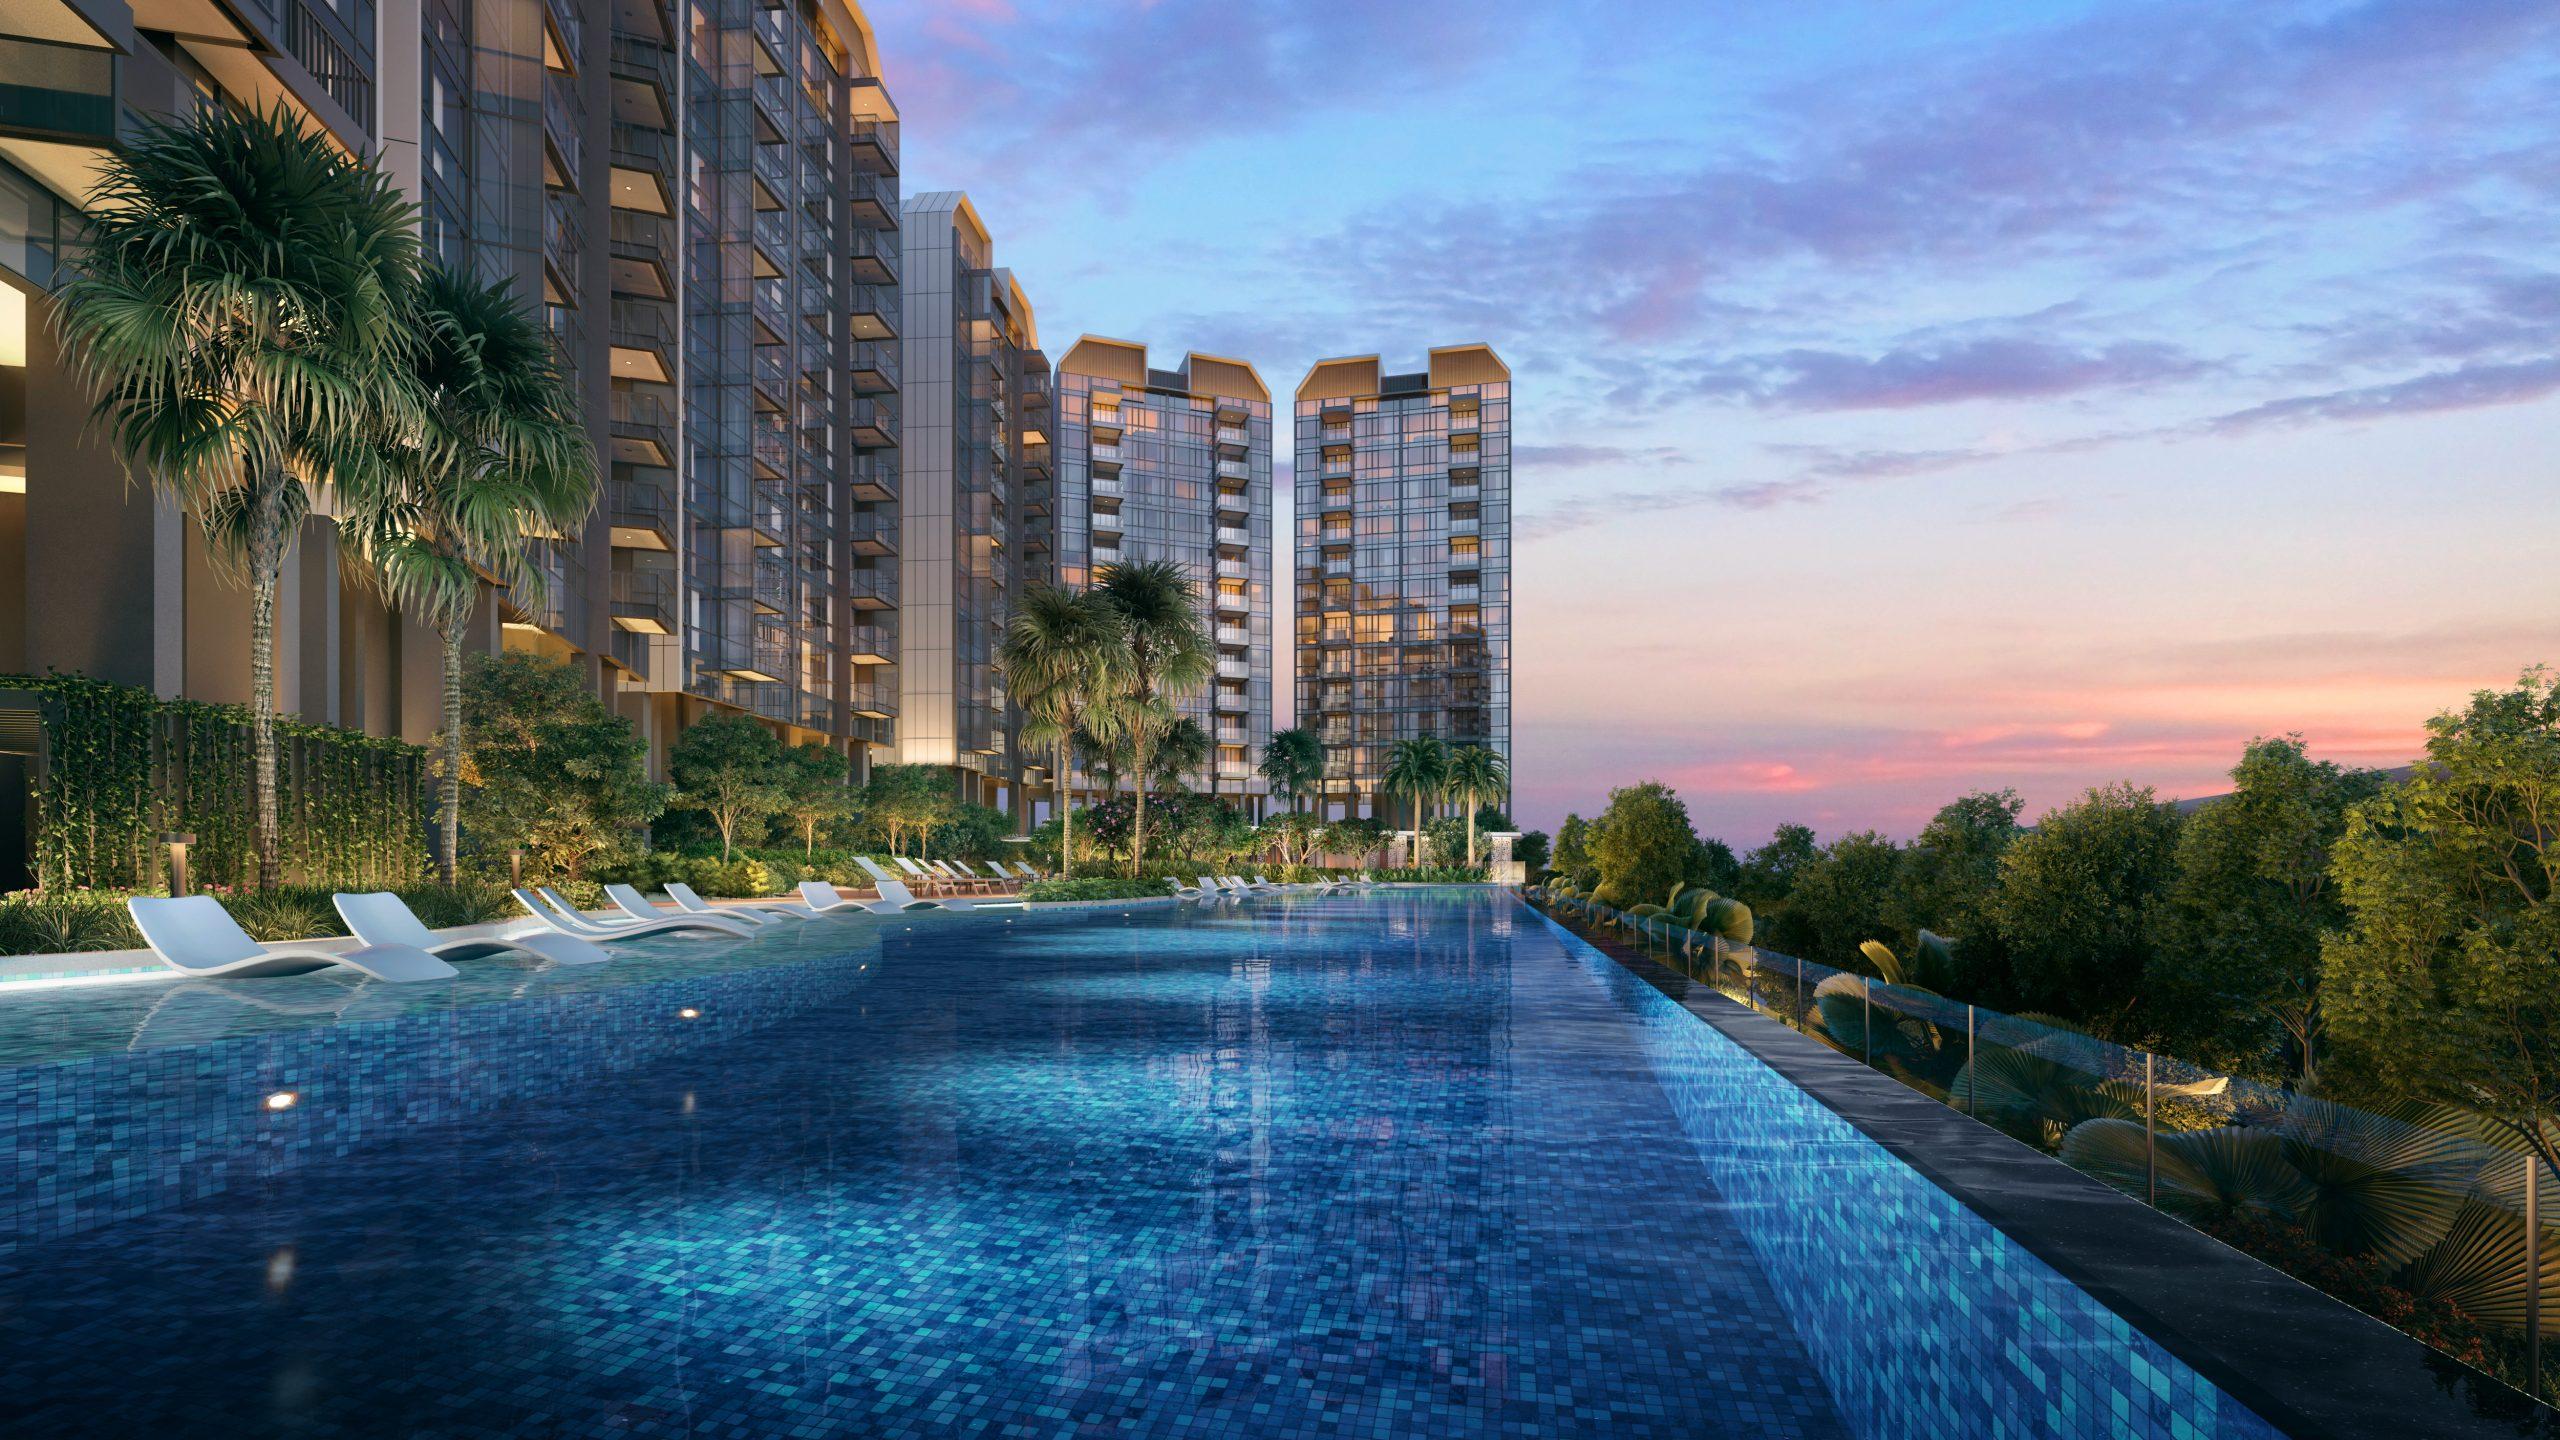 Hyll-on-Holland-Lake-Pool-singapore